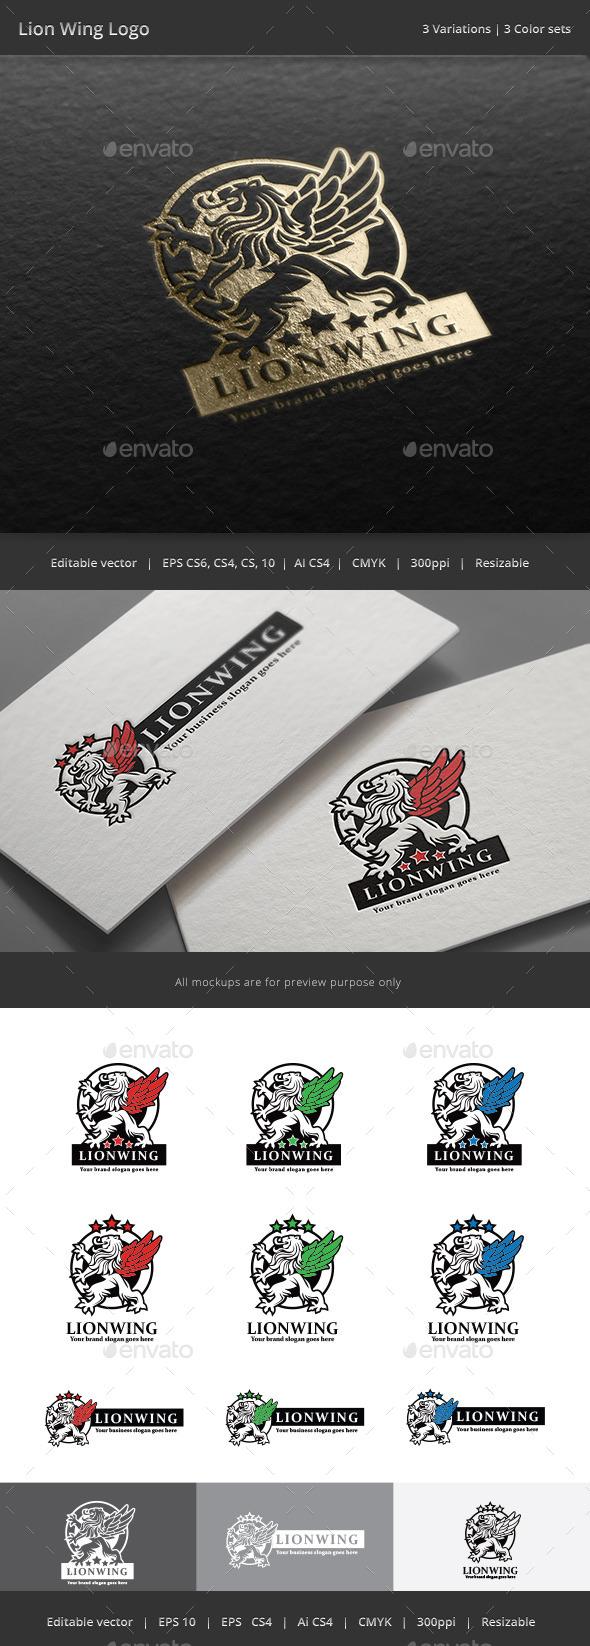 Lion Wing Crest Logo - Crests Logo Templates